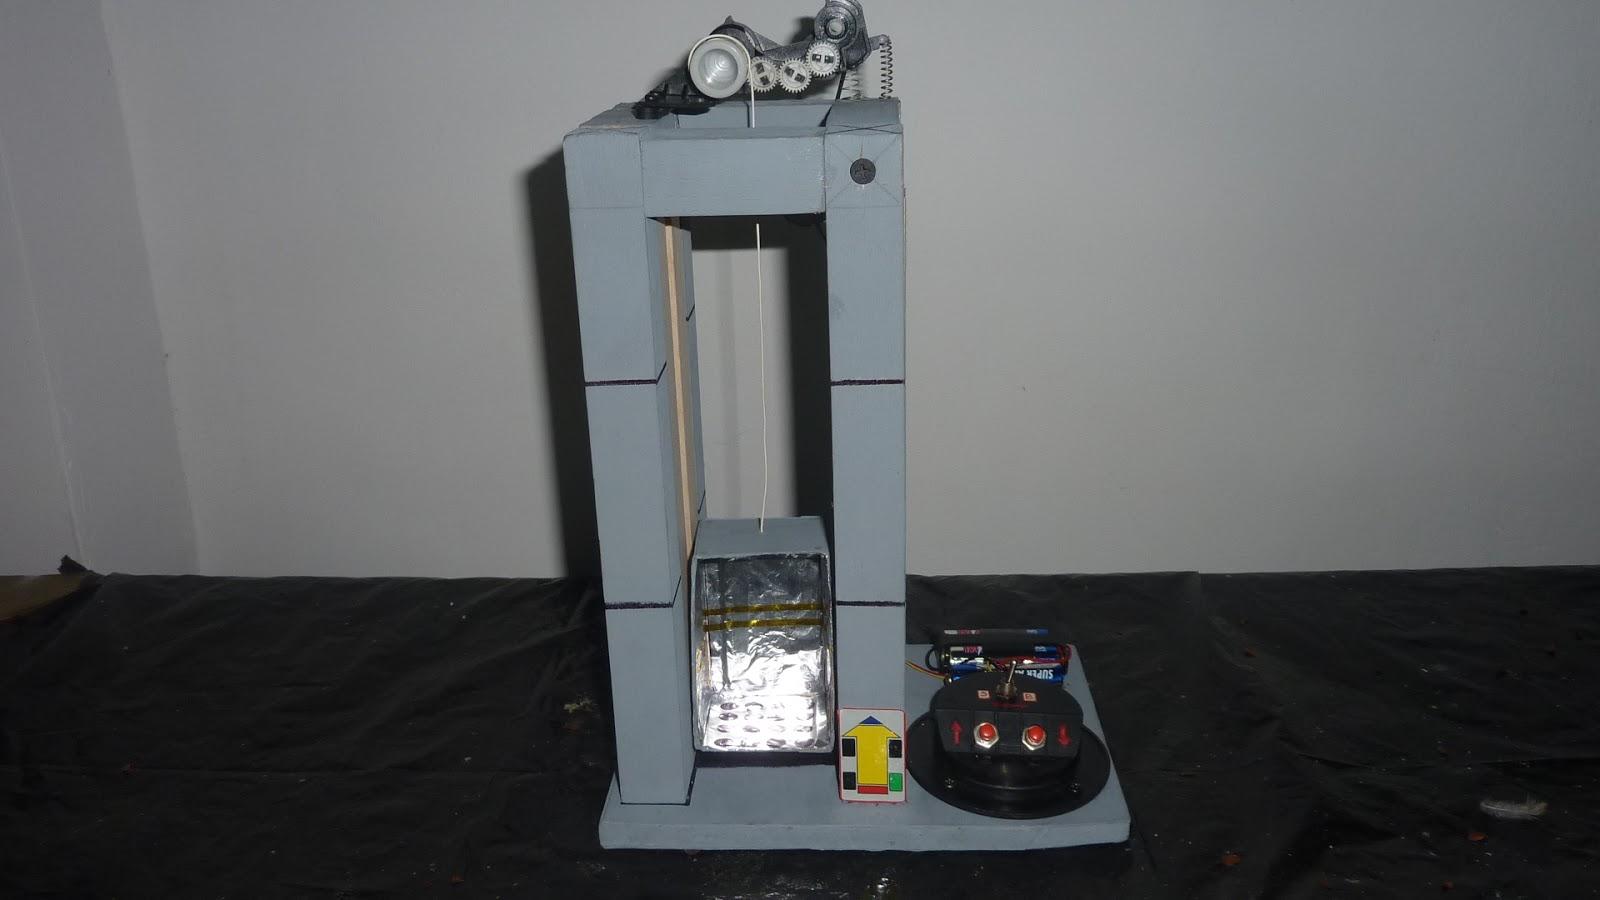 Ascensor didactico ascensor did ctico casero for Materiales para hacer un ascensor